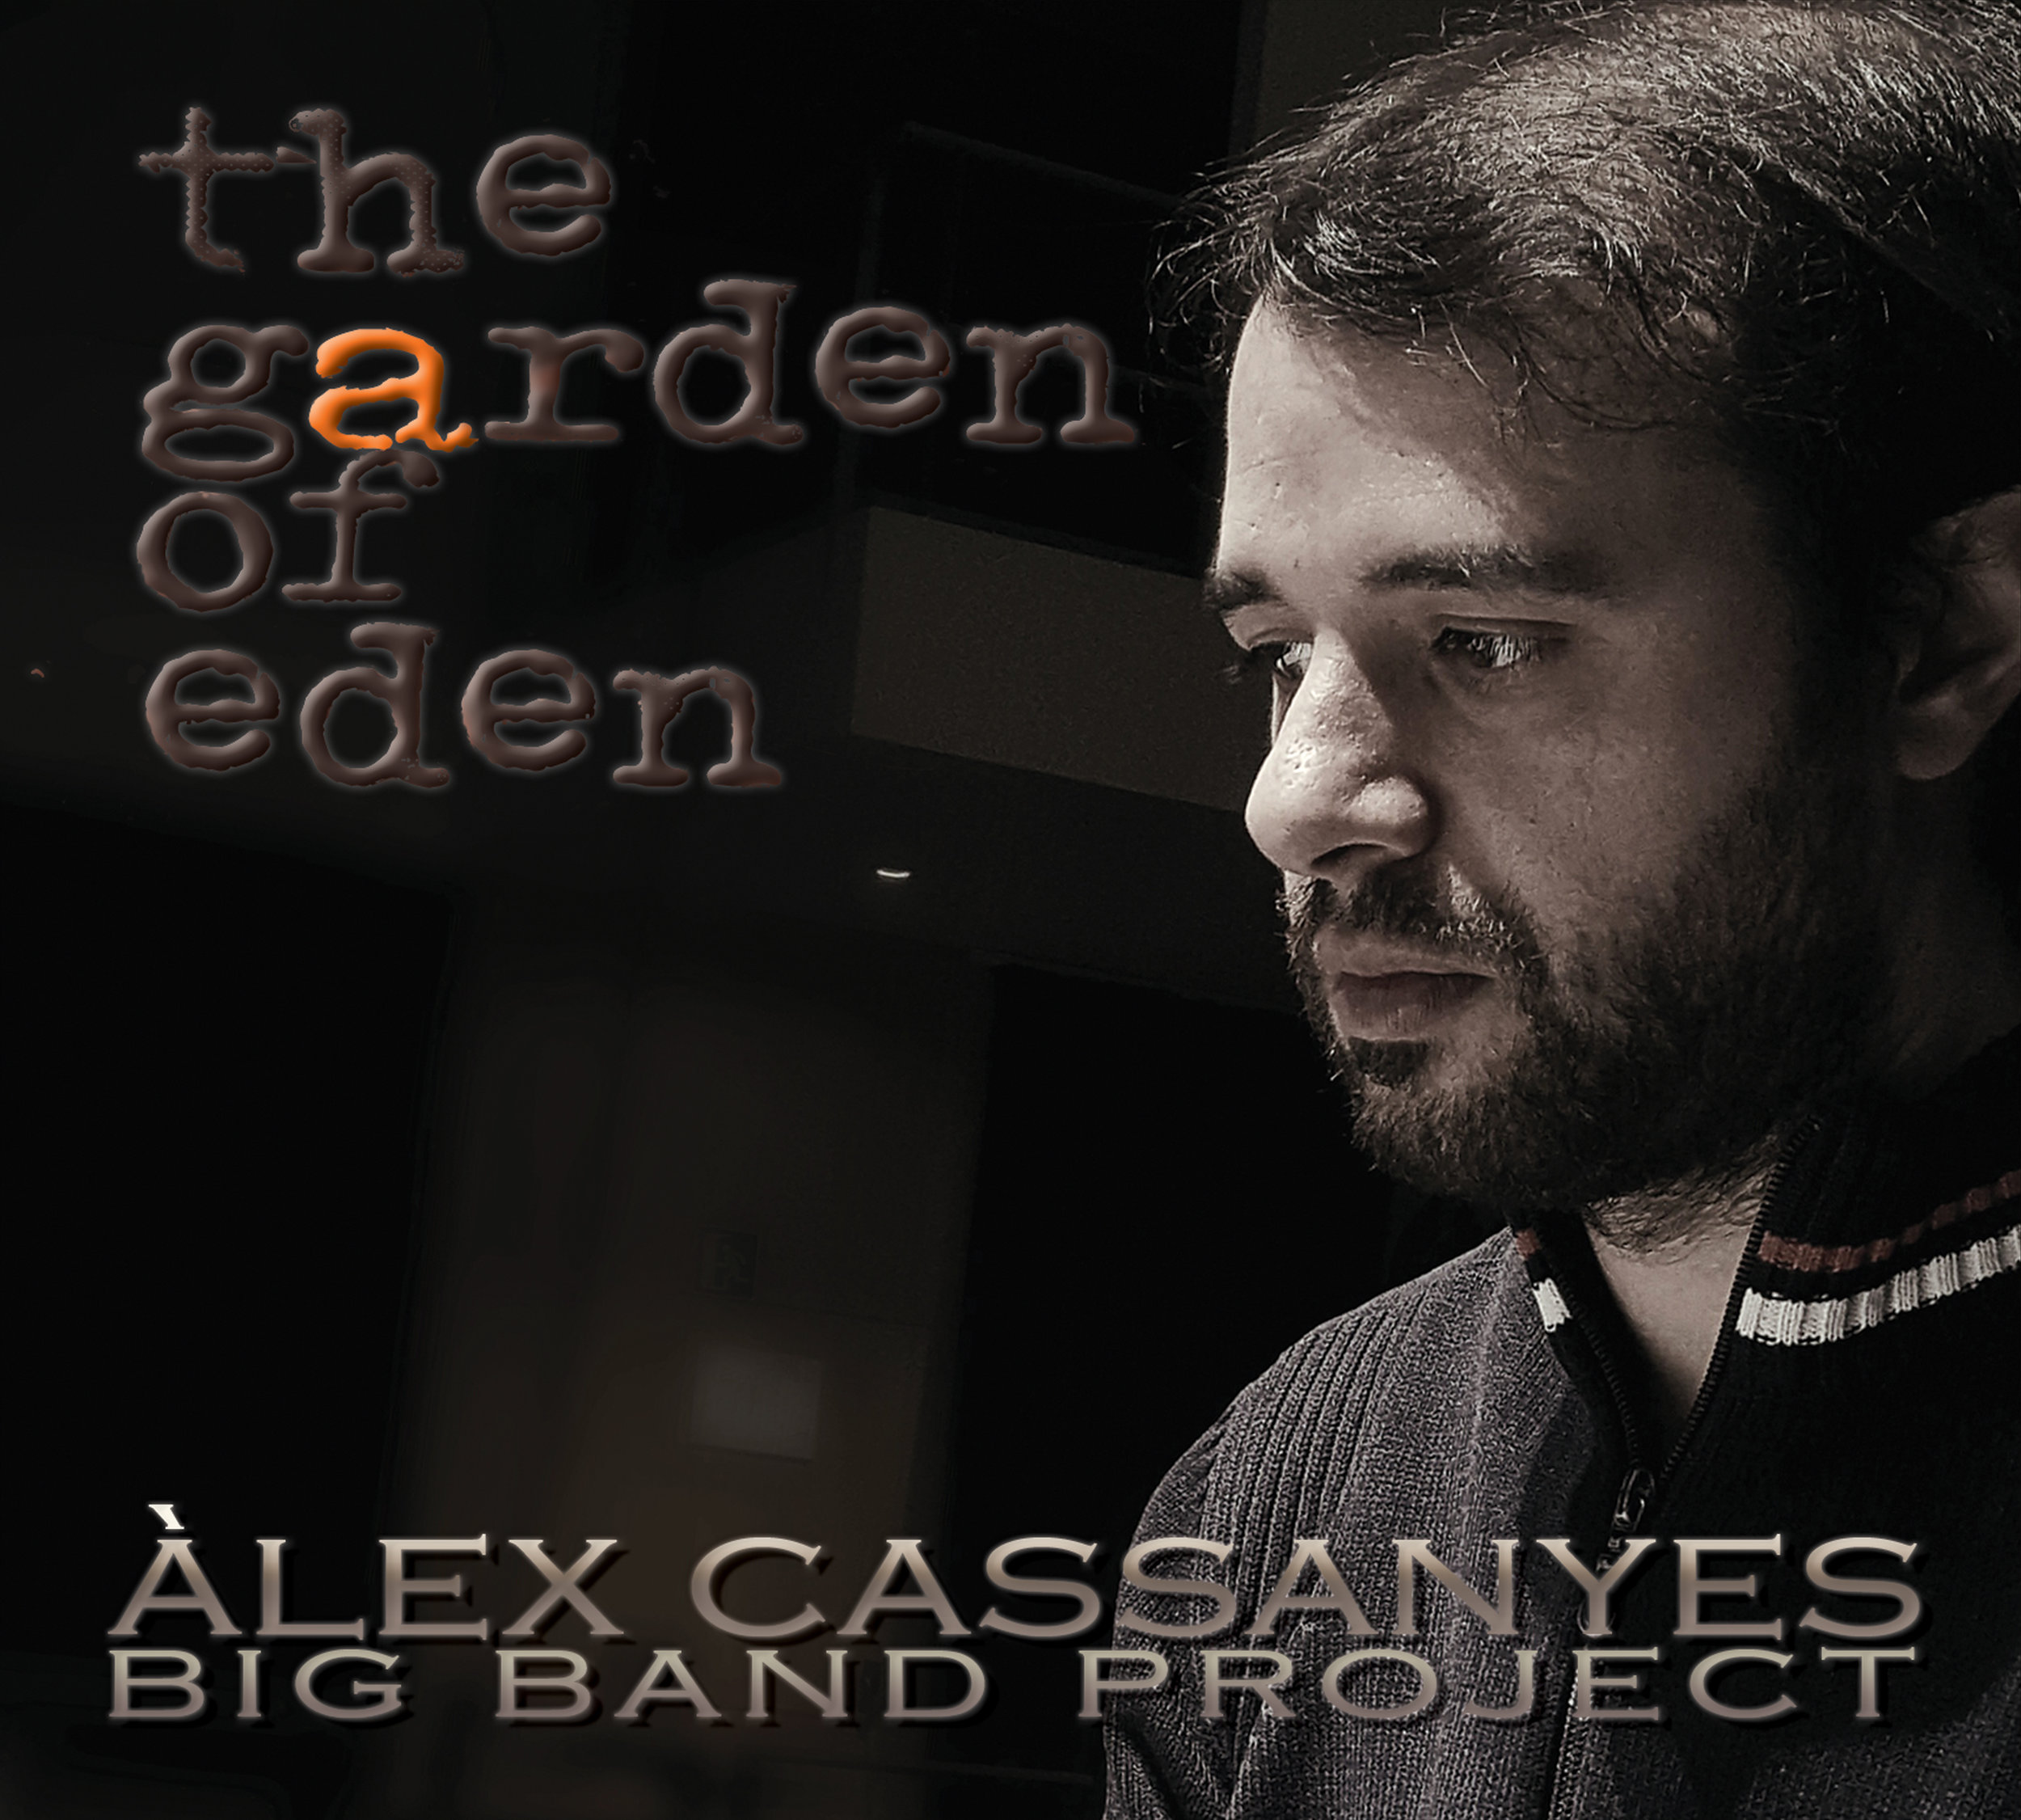 Portada - The Garden of Eden - Àlex Cassanyes Big Band Project.jpg